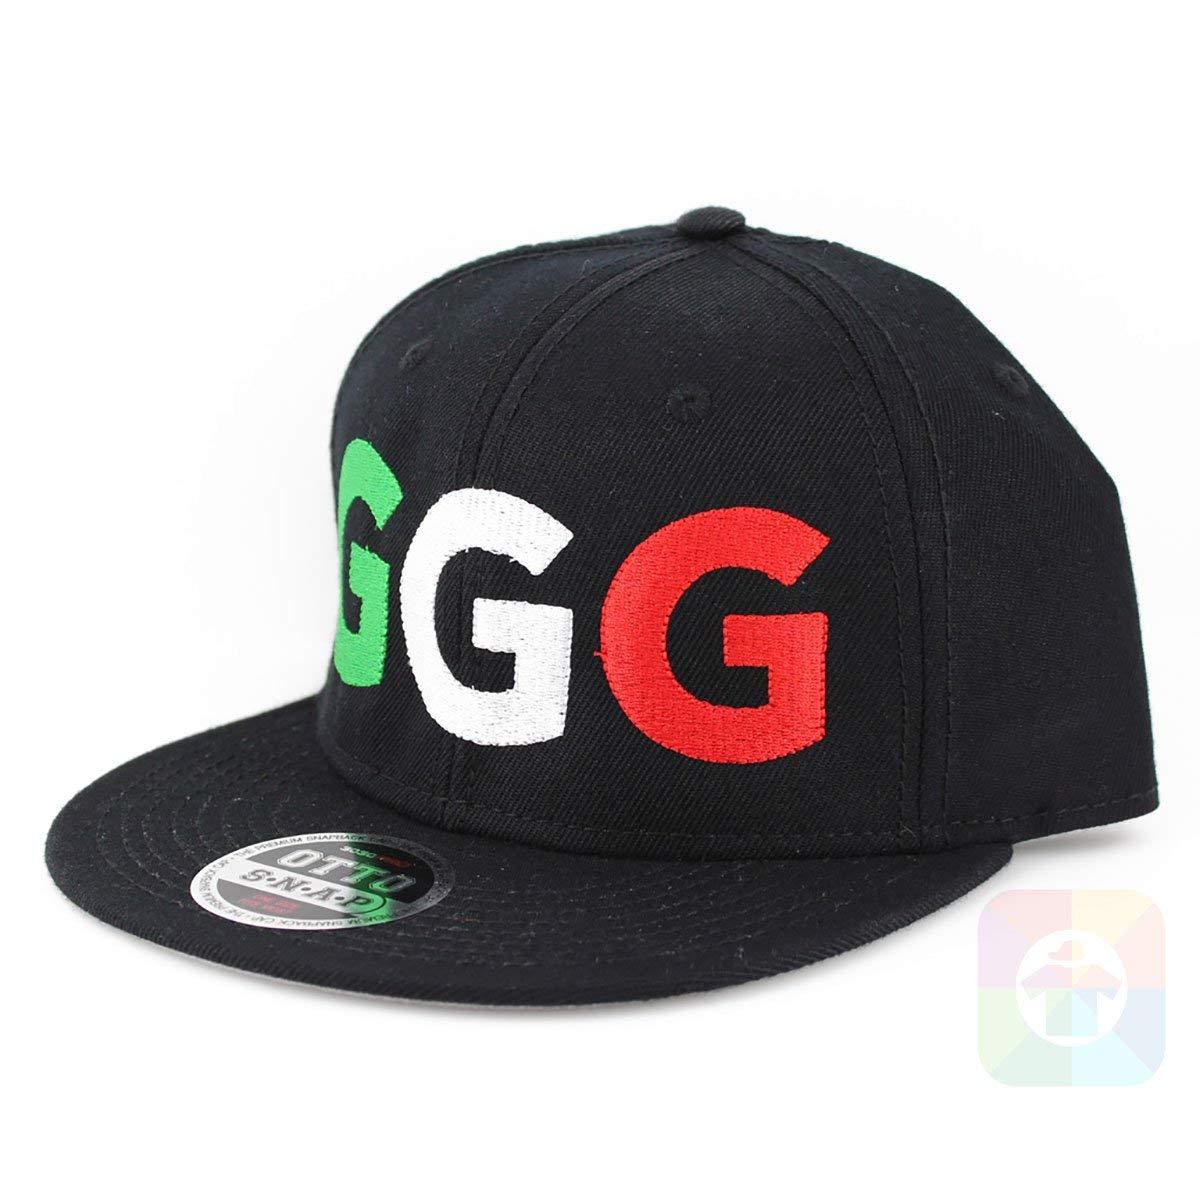 524fee87e44 Get Quotations · GGG Flat Bill Boxing Cap Six Panel Pro Style Snapback  OttoCap #2226